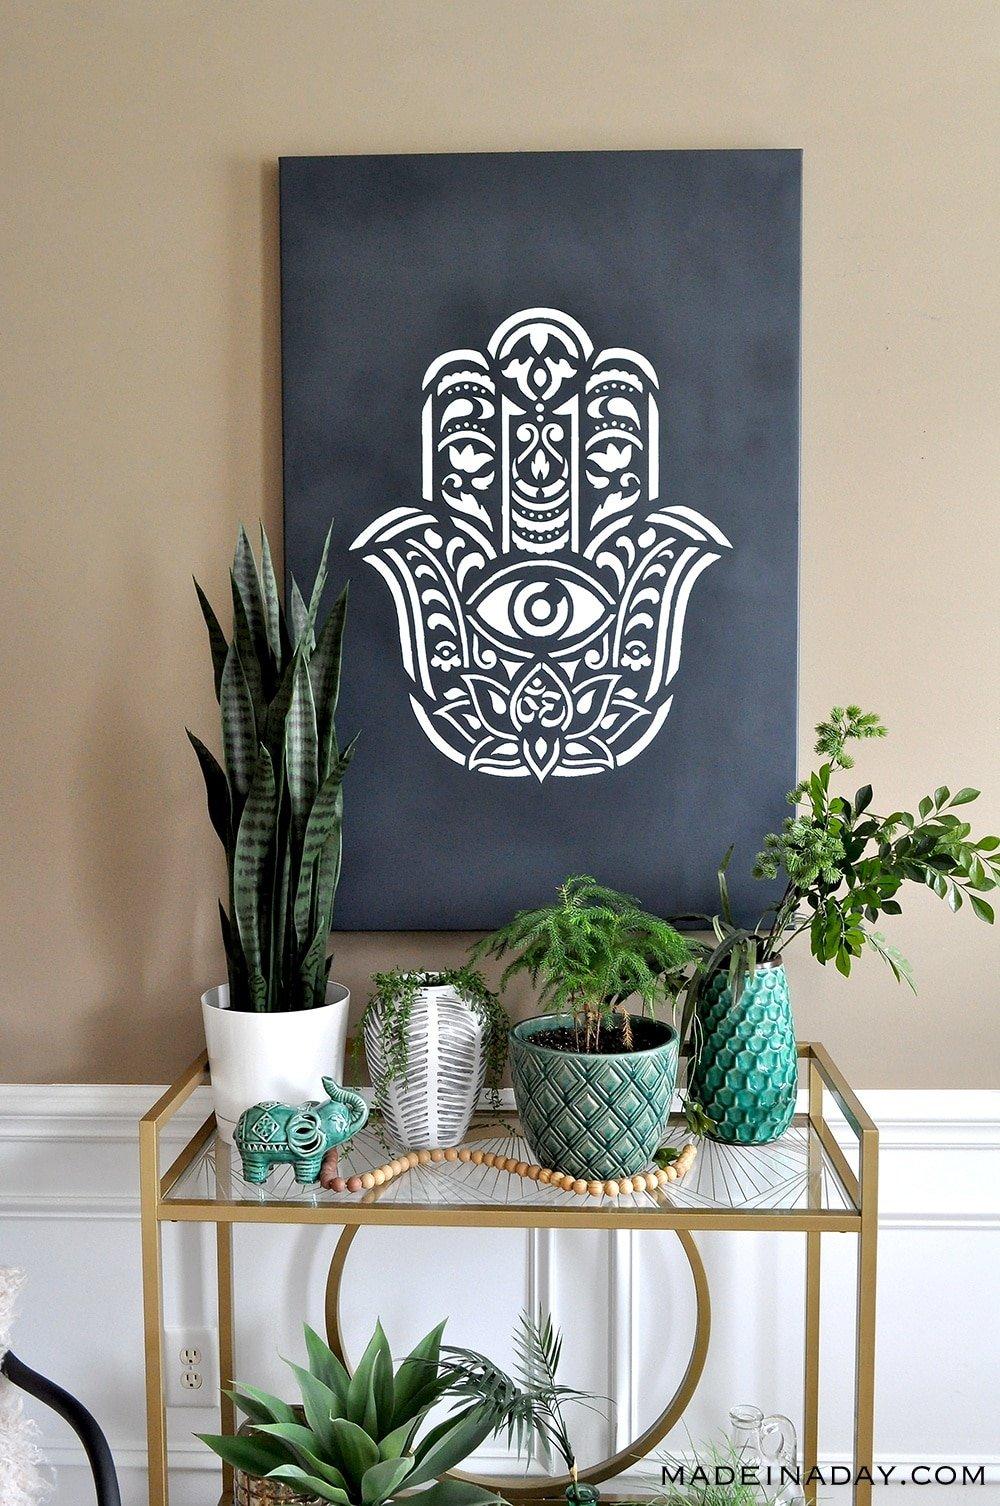 Hamsa Palm Stenciled Wall Art, Hamsa Design, Hand of Fatima